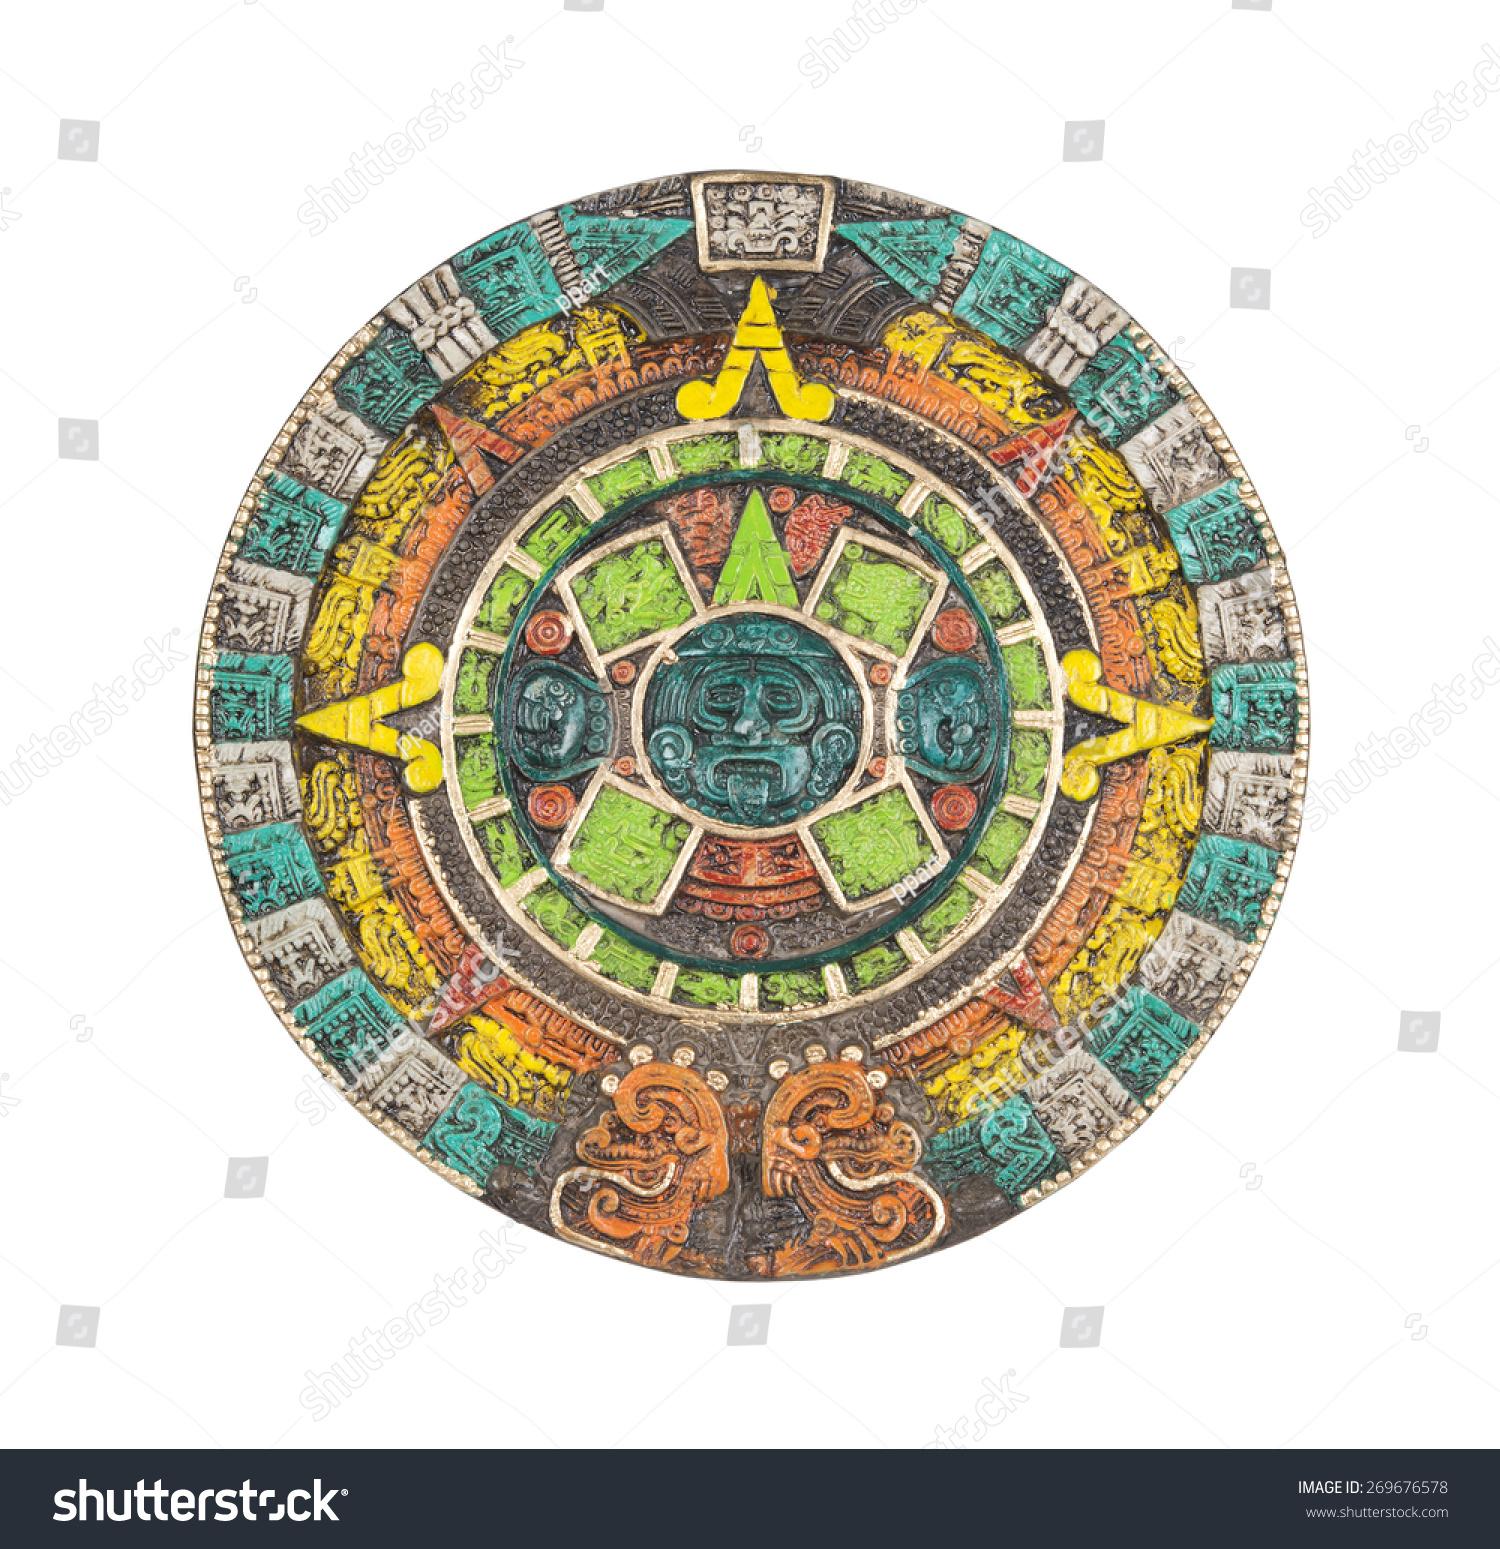 mayan astronomy symbols - photo #31